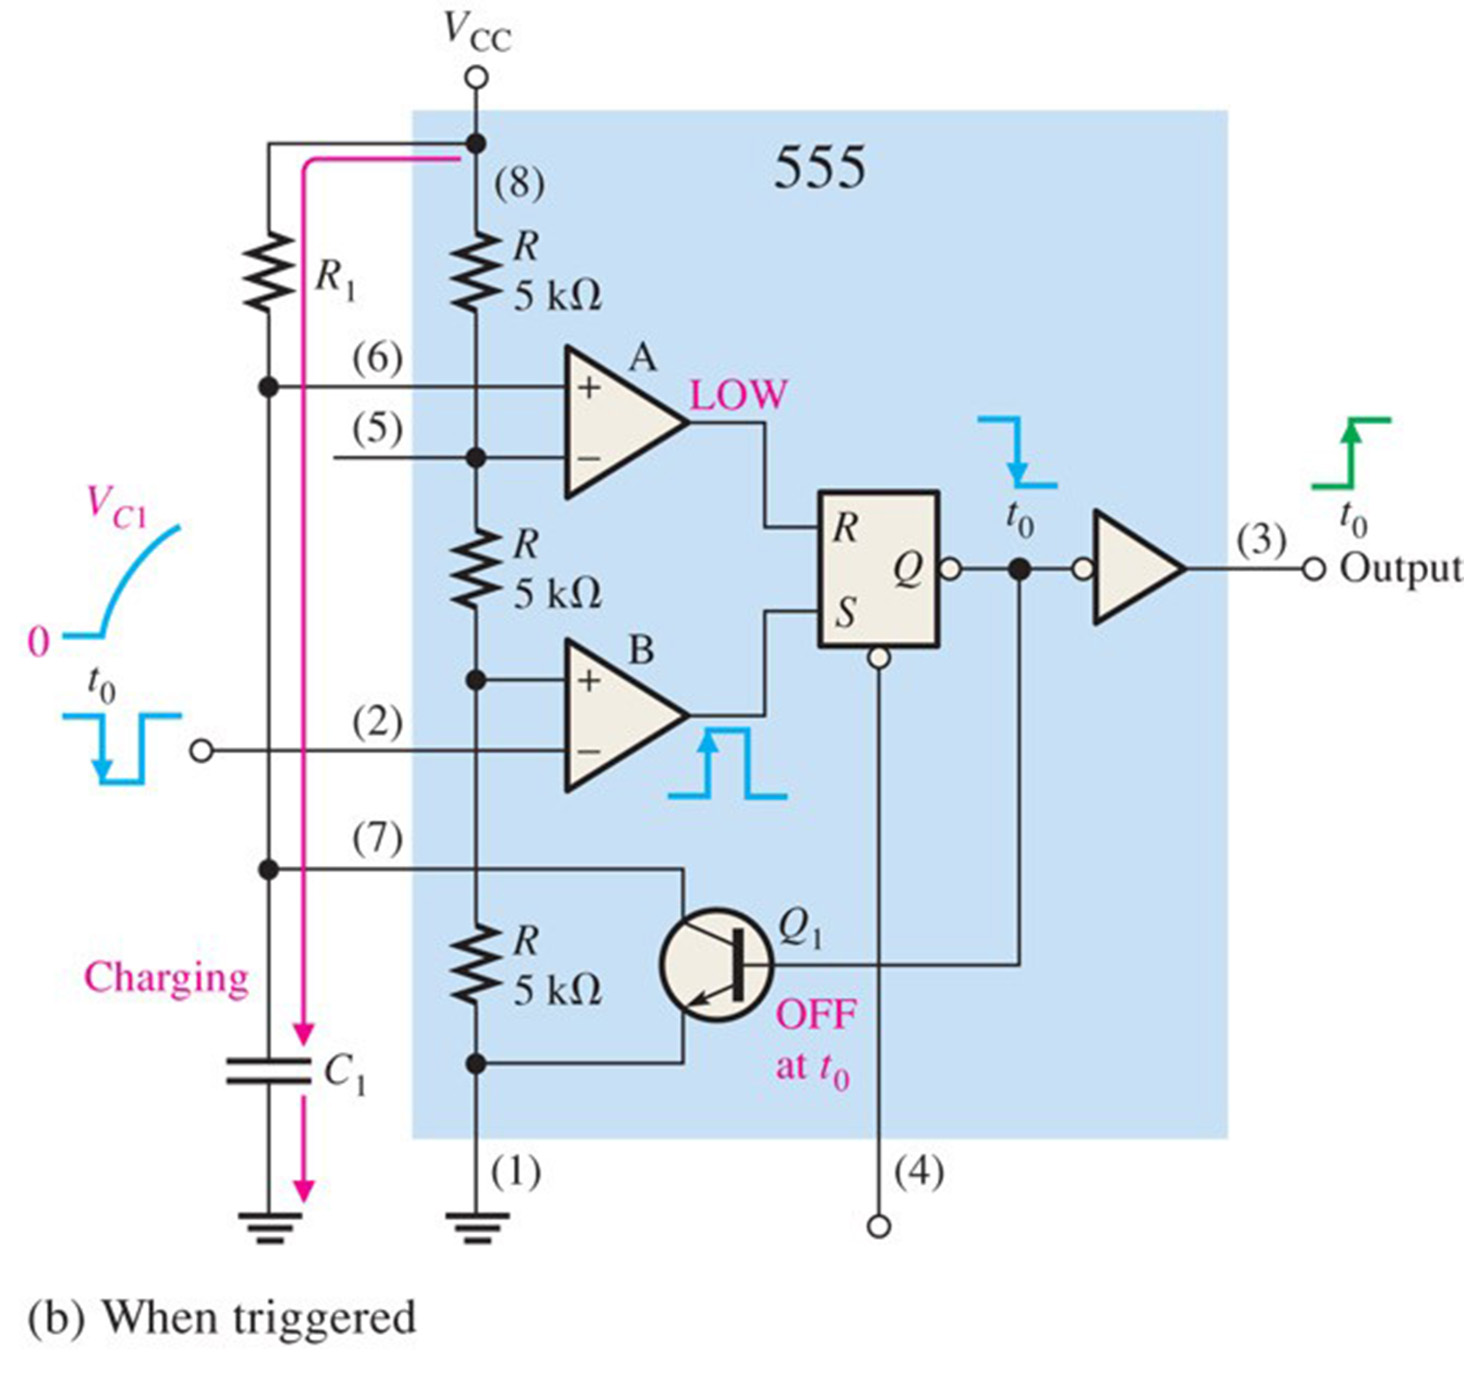 Pgt104lab02 Azman Unimap Astable Flipflop Multivibrator Circuit Oscillatorcircuit Signal Disclaimer